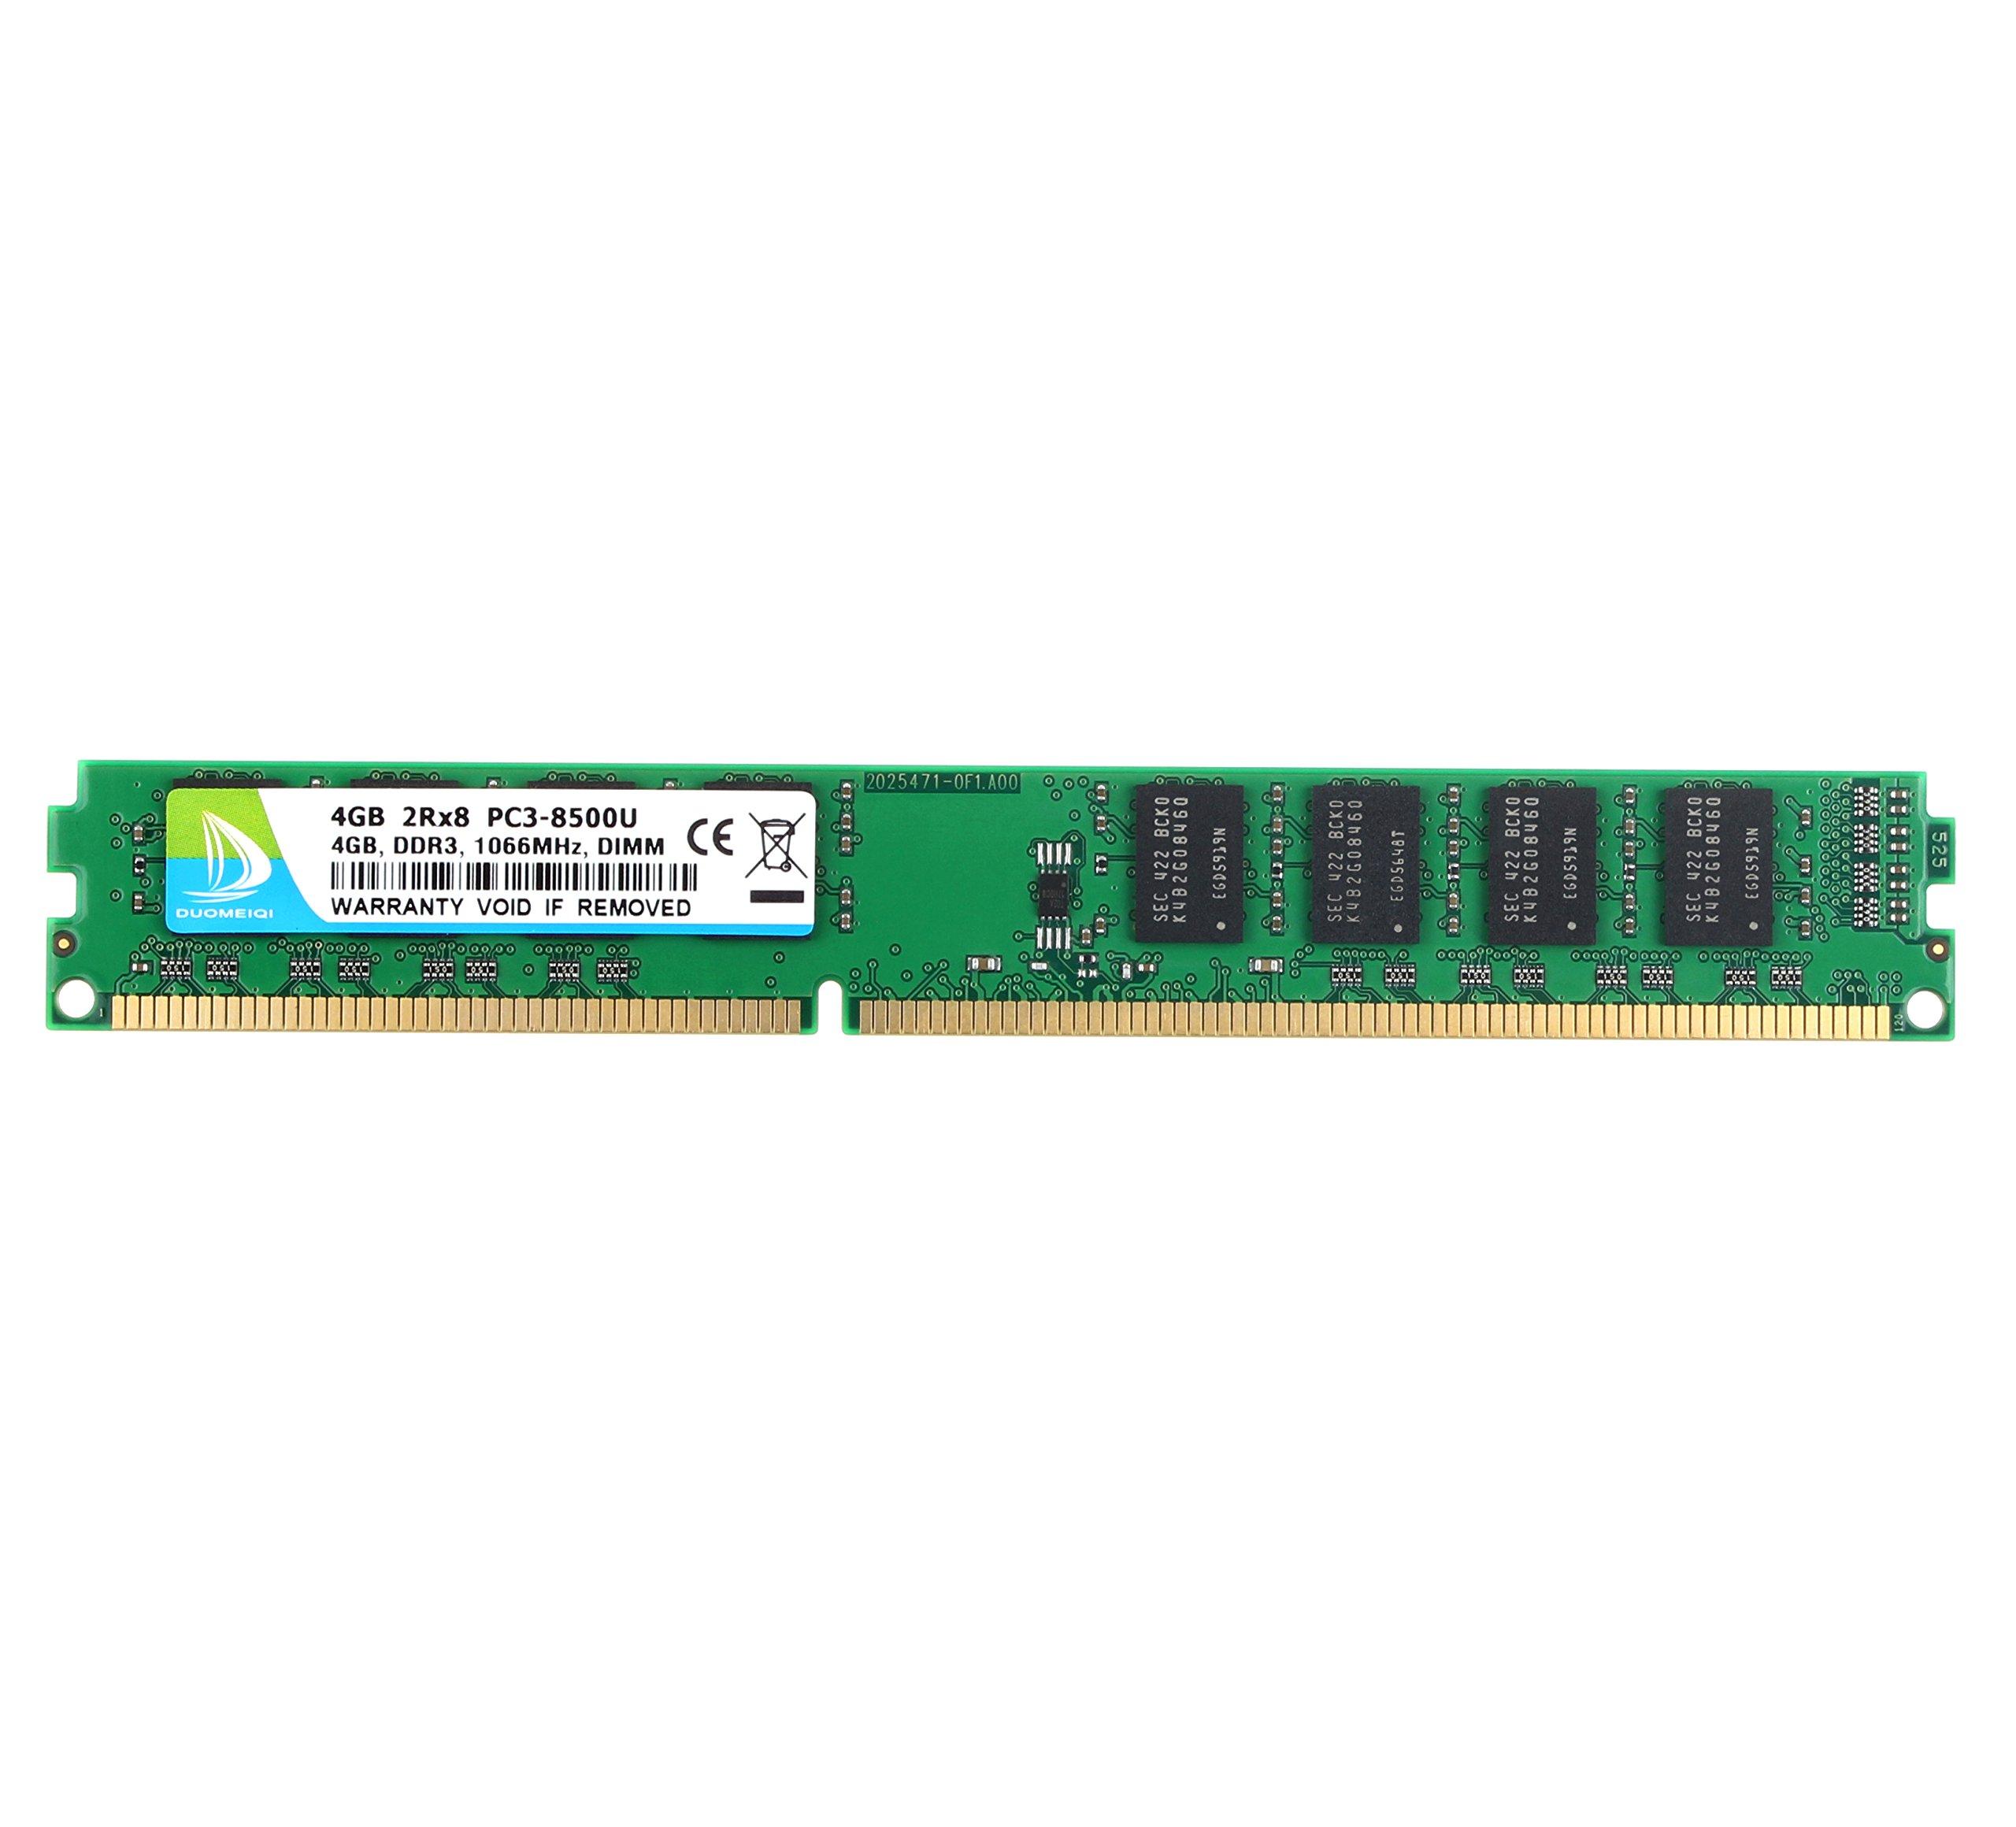 DUOMEIQI 4GB DDR3 1066MHz UDIMM 2RX8 PC3-8500 240pin CL7 1 5v Unbuffered  Non-ECC Desktop Memory RAM Module for Intel AMD System